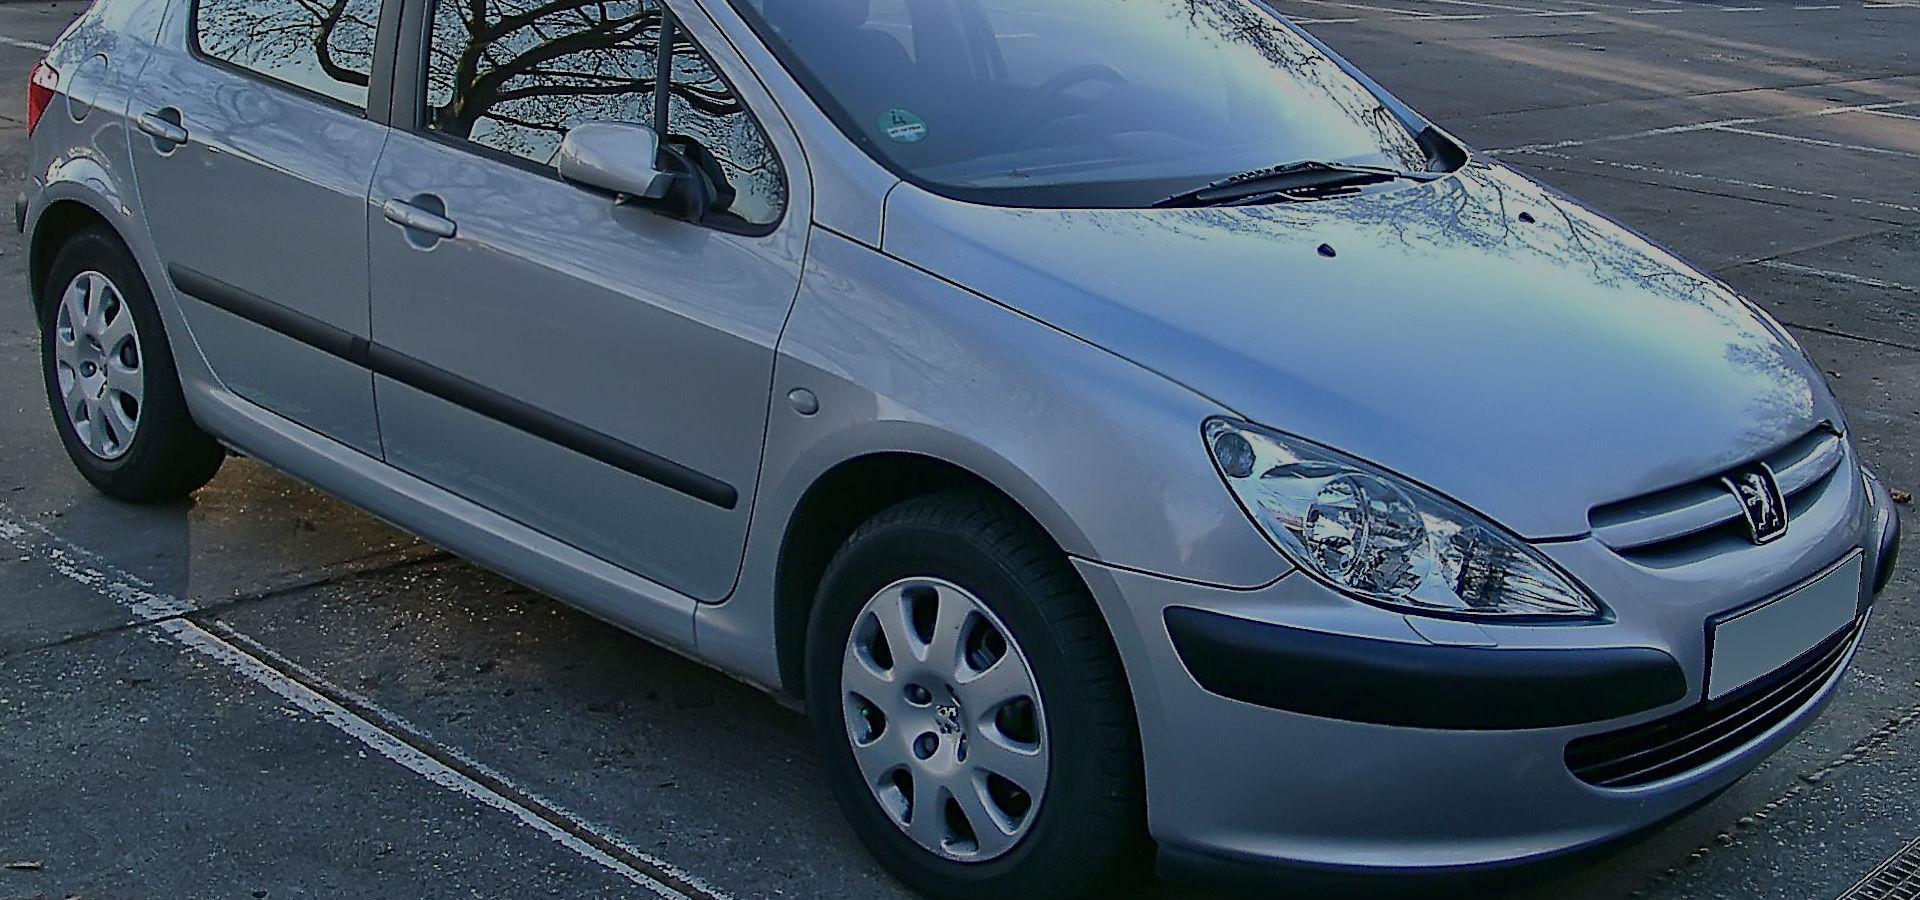 Citroen & Peugeot Specialists